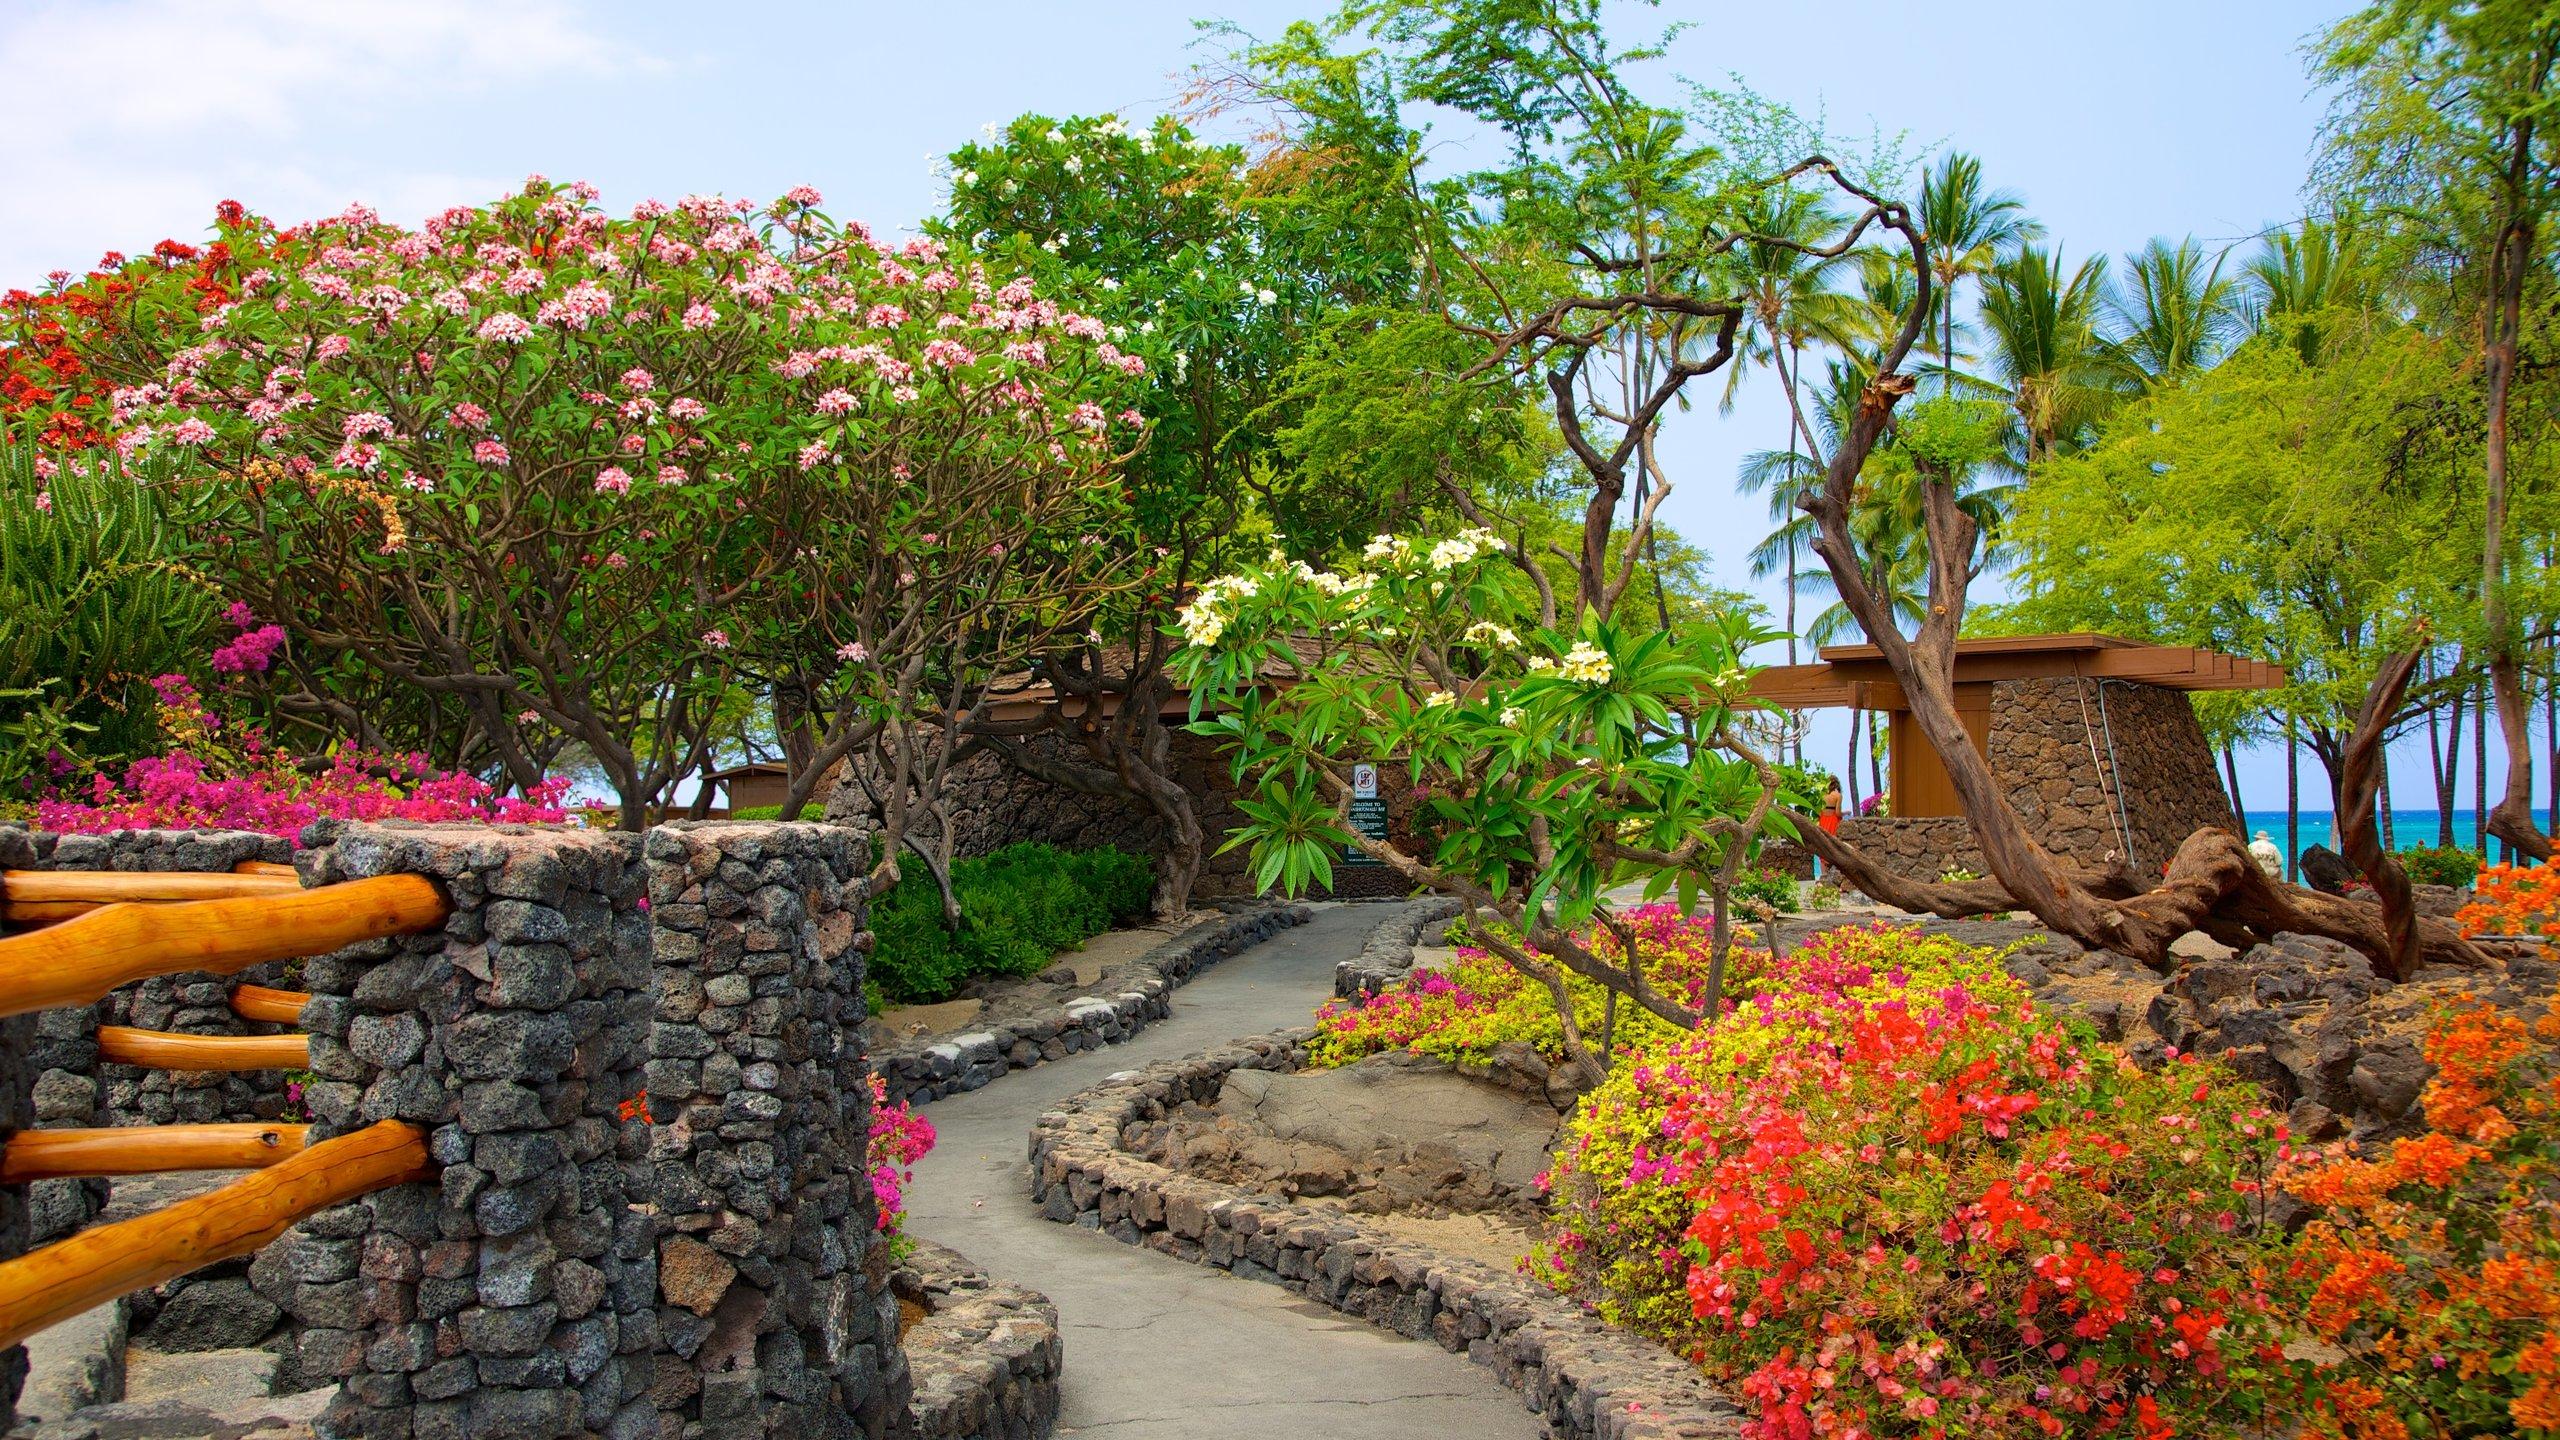 Waikoloa Beach Resort, Waikoloa, Hawaii, United States of America